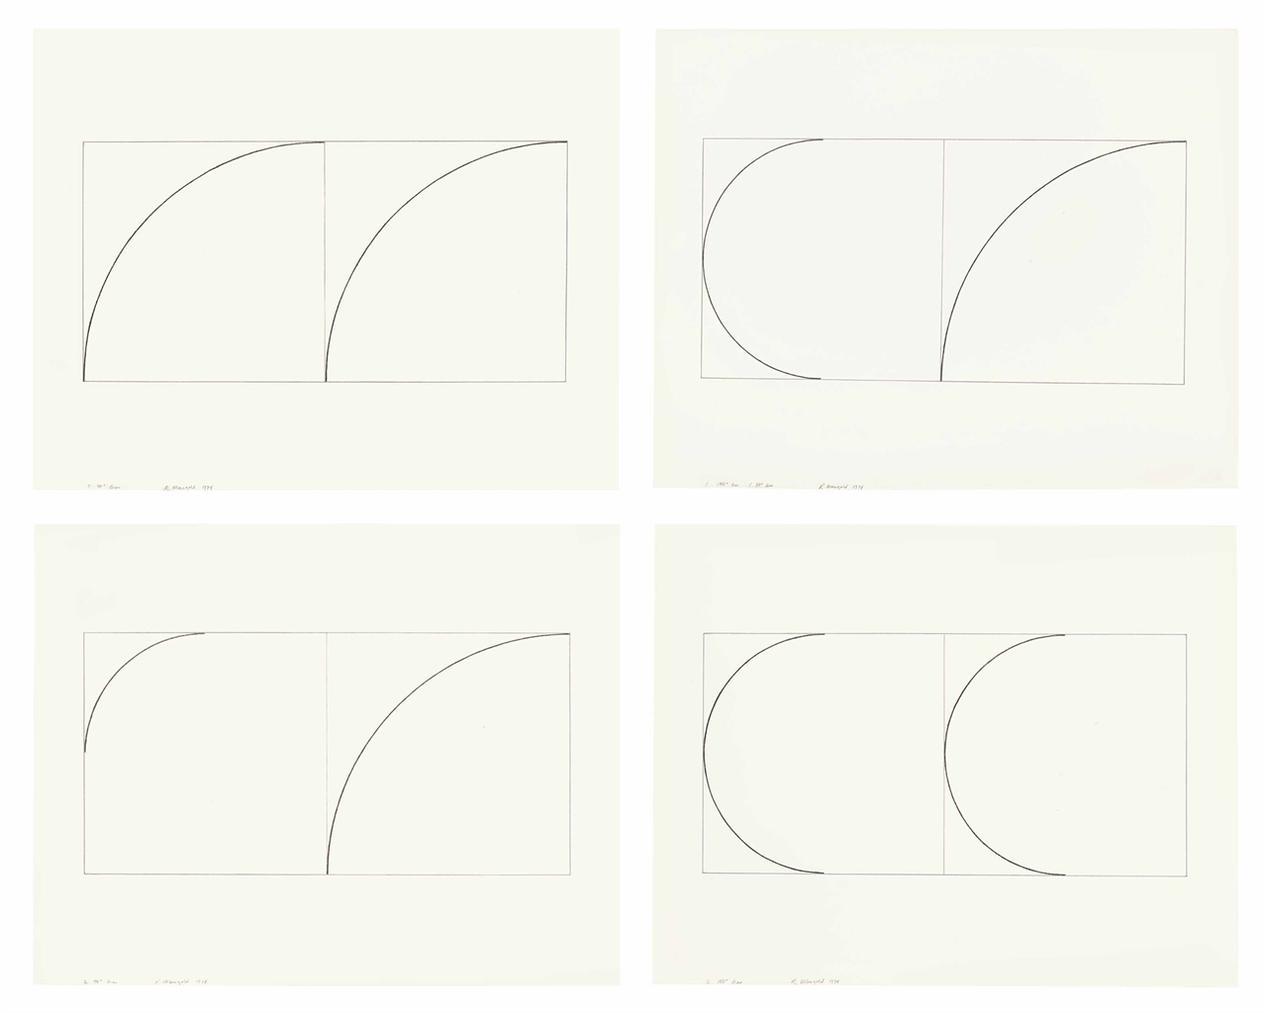 Robert Mangold-2 180degrees Arcs; 1 180degrees Arc 1 90degrees Arc; 2 90degrees Arcs; 2 90degrees Arcs-1974